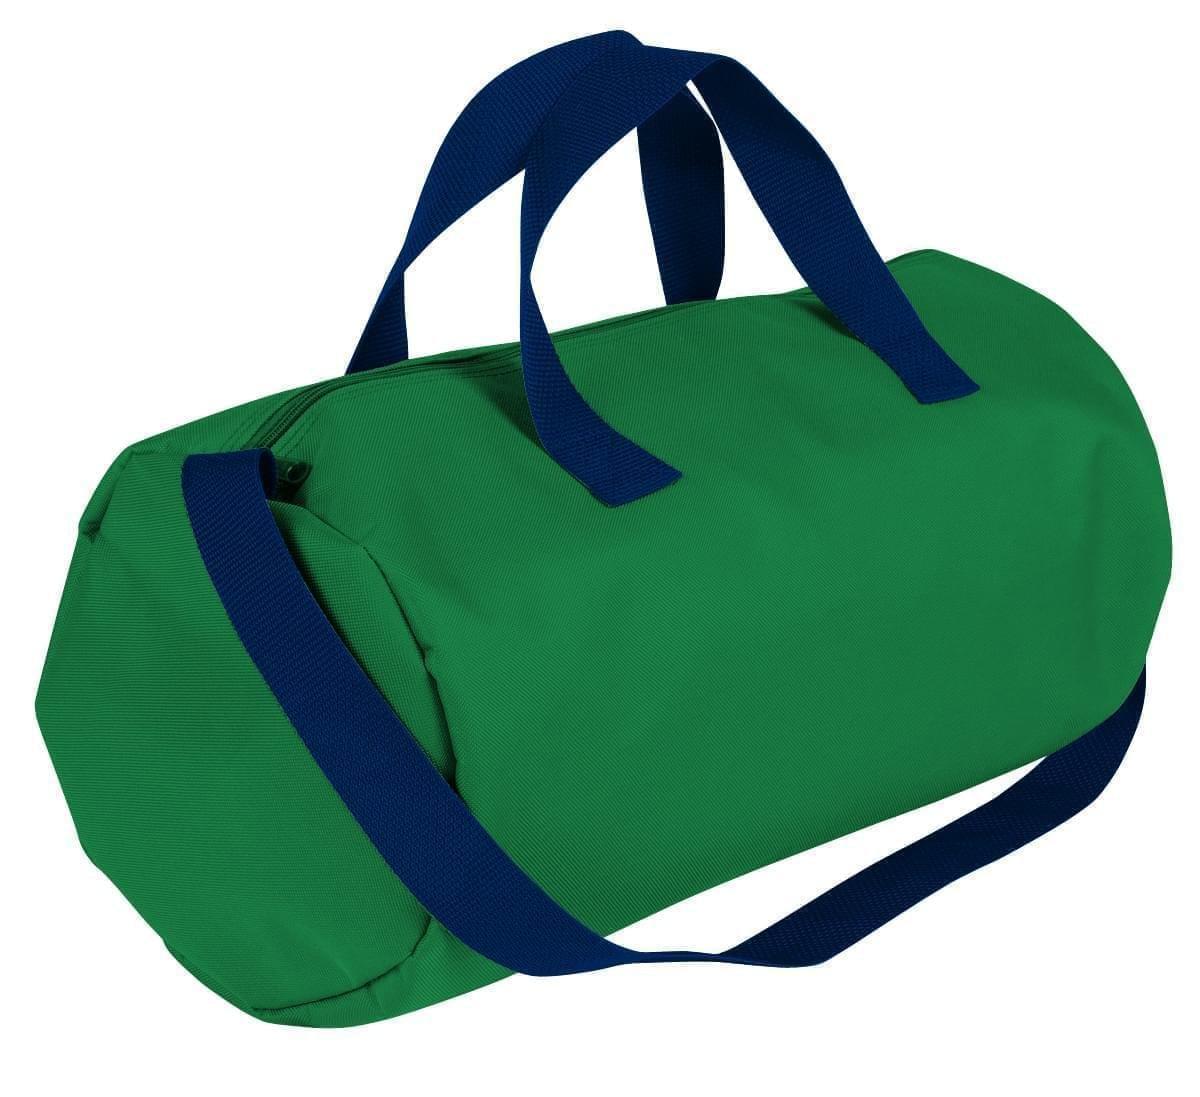 USA Made Nylon Poly Gym Roll Bags, Kelly Green-Navy, ROCX31AATZ